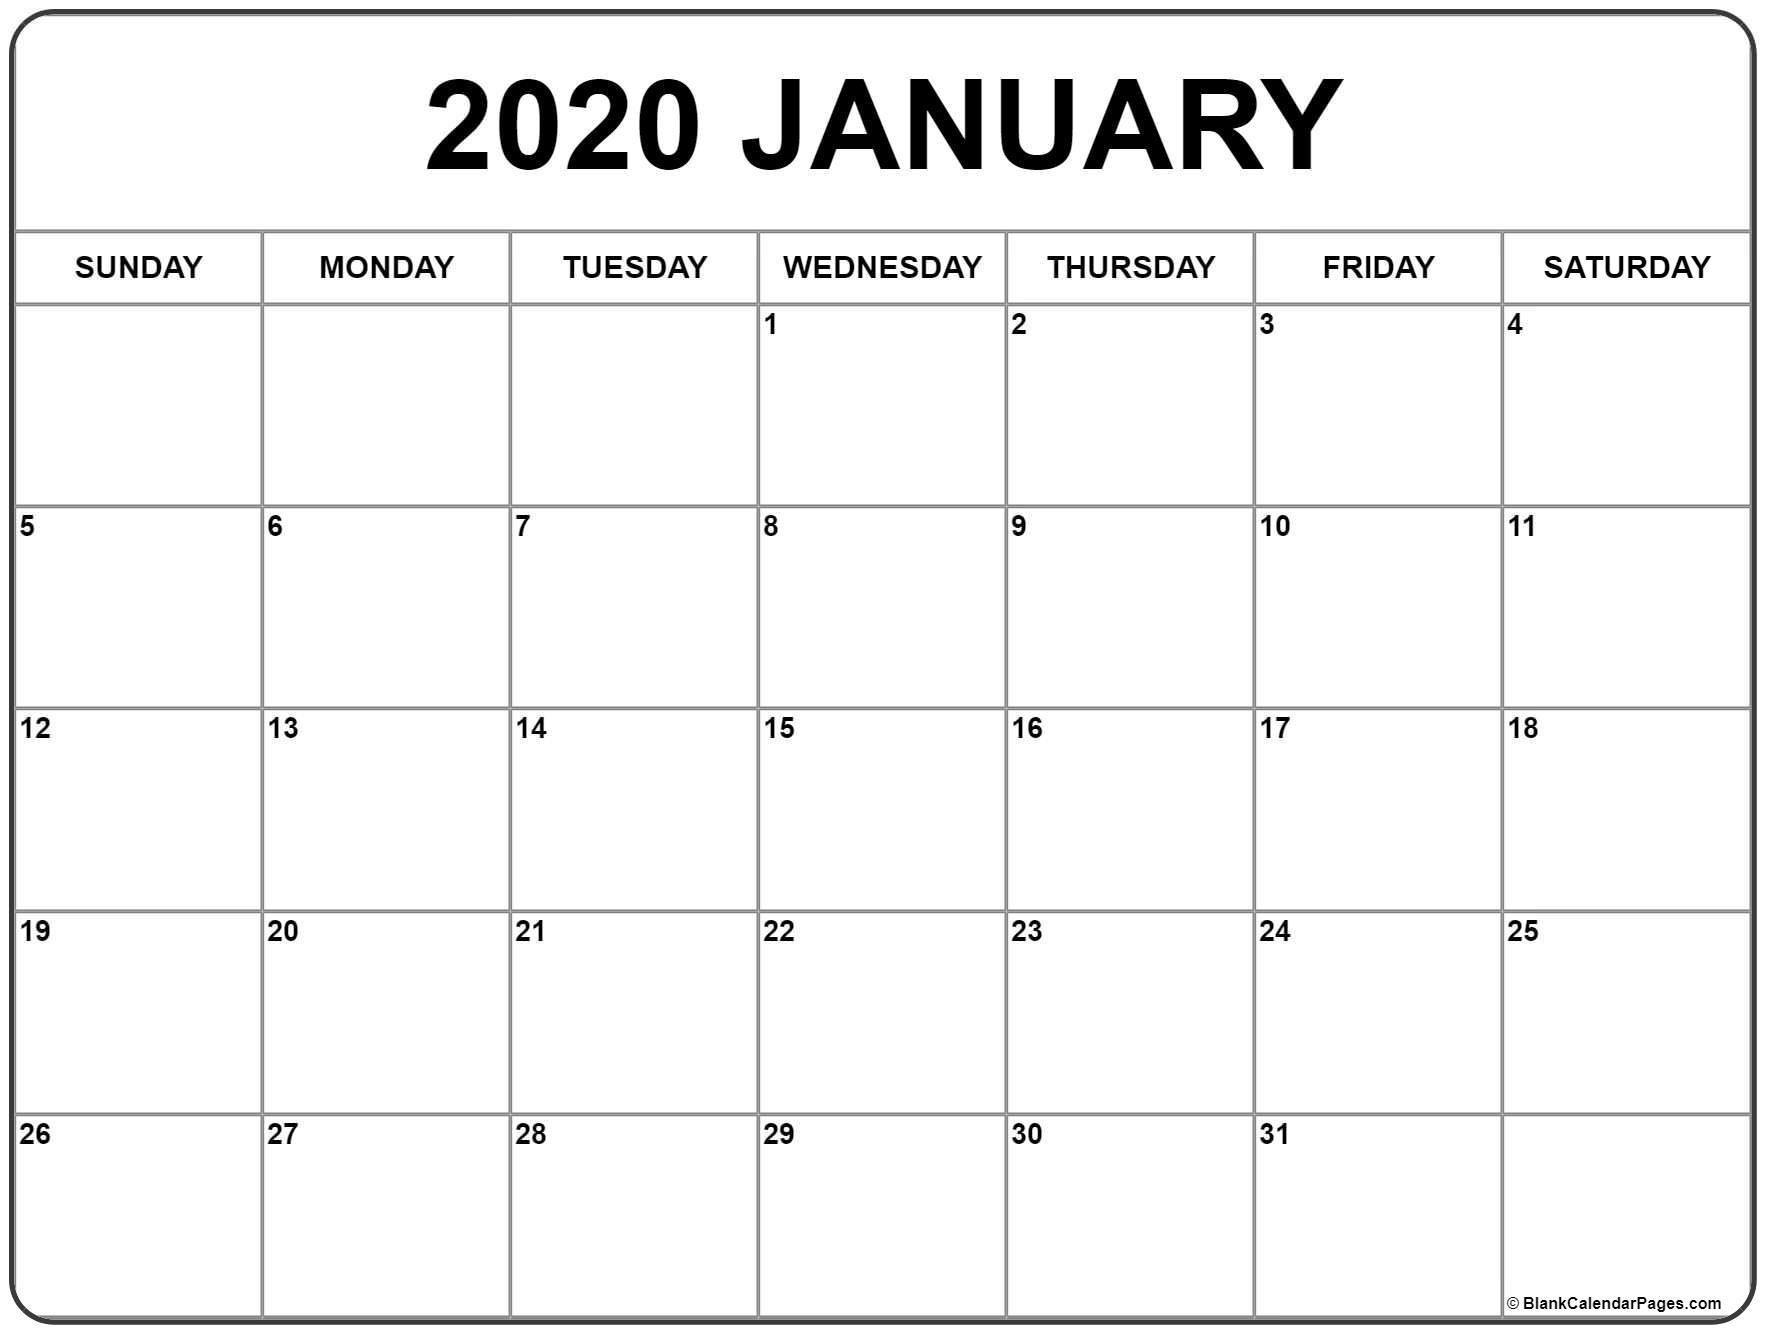 January 2020 Calendar | Free Printable Monthly Calendars-January 2020 Calendar Canada Printable